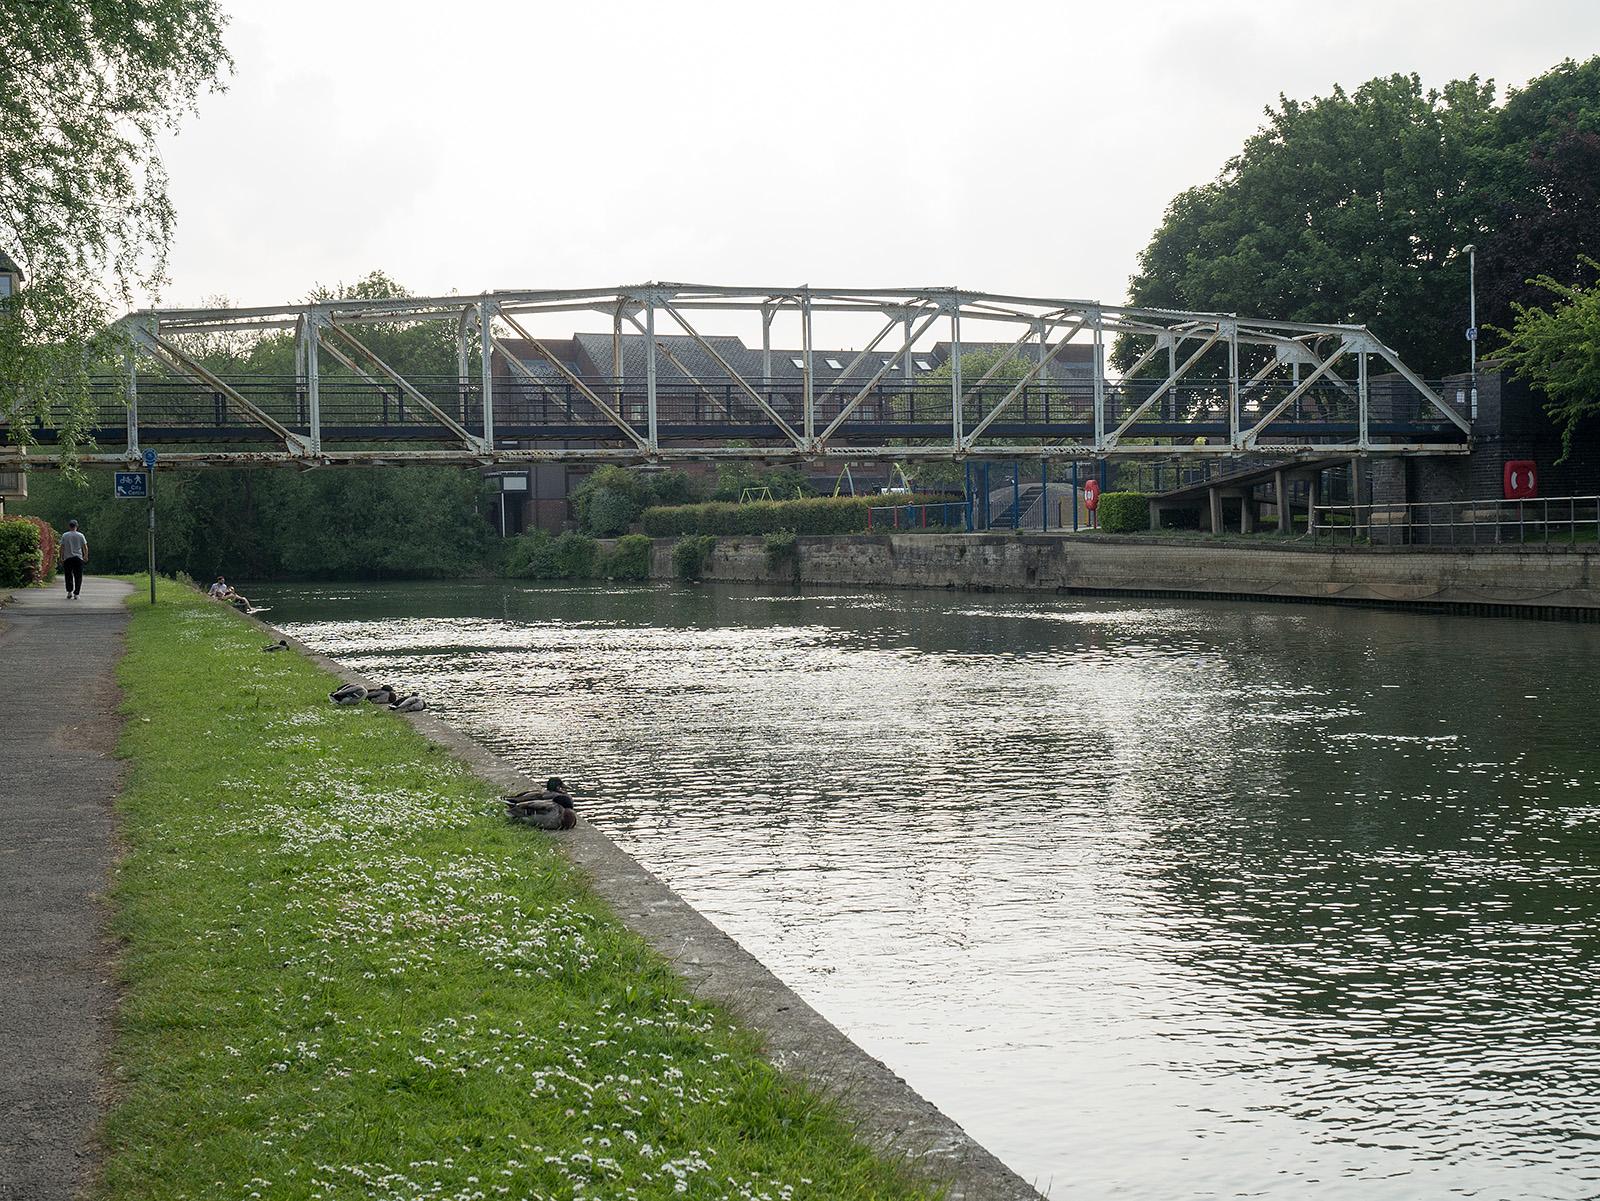 Bridge between Friars and Baltic wharves